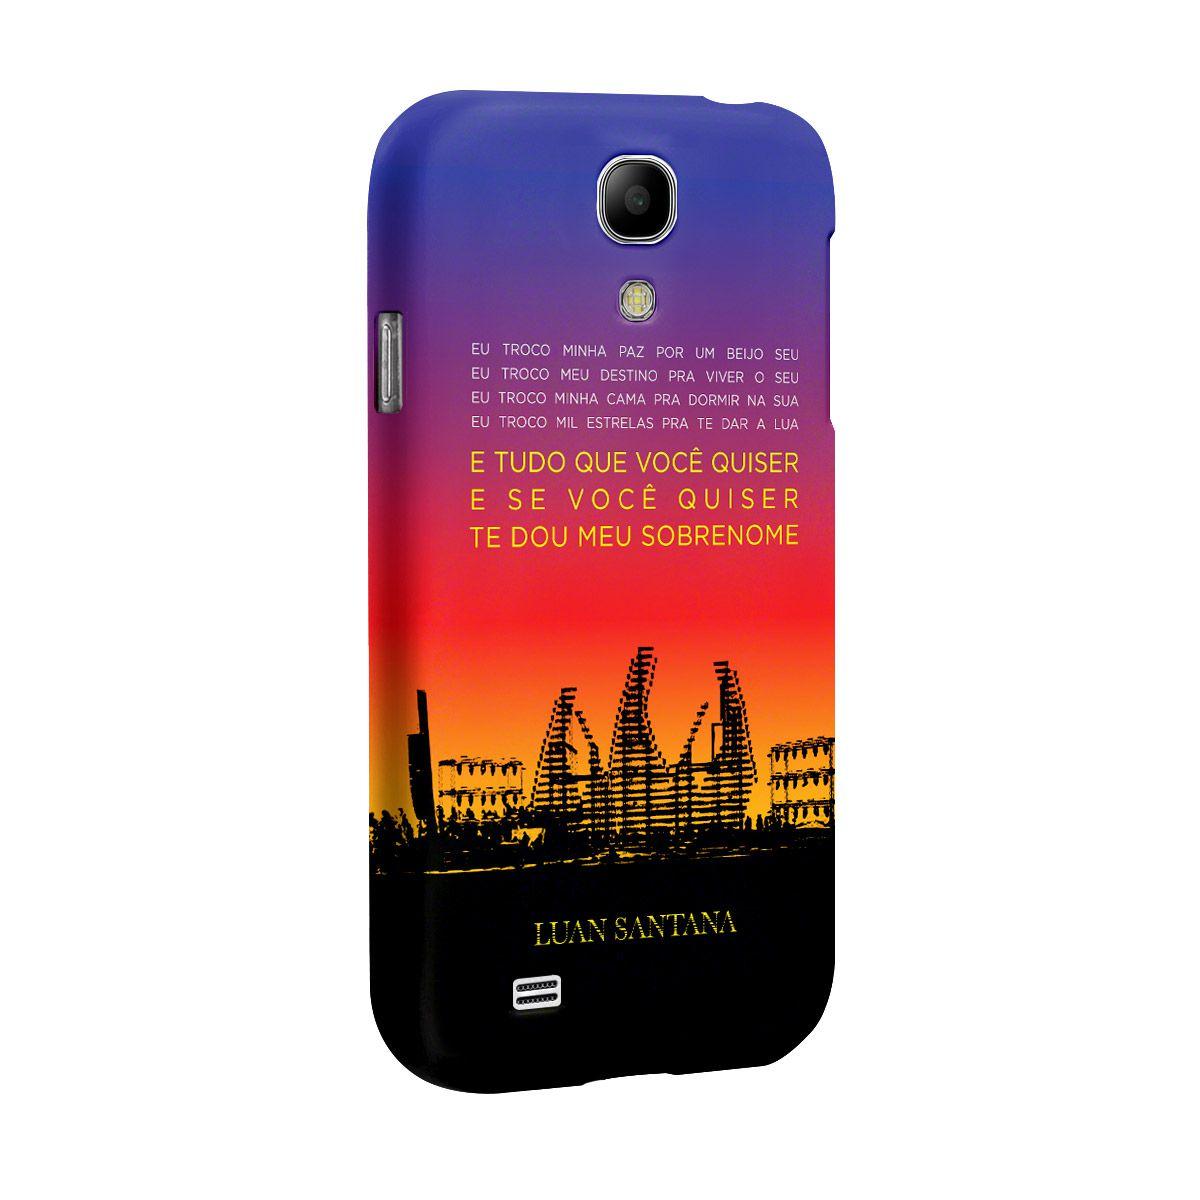 Capa para Celular Samsung Galaxy S4 Luan Santana Concept